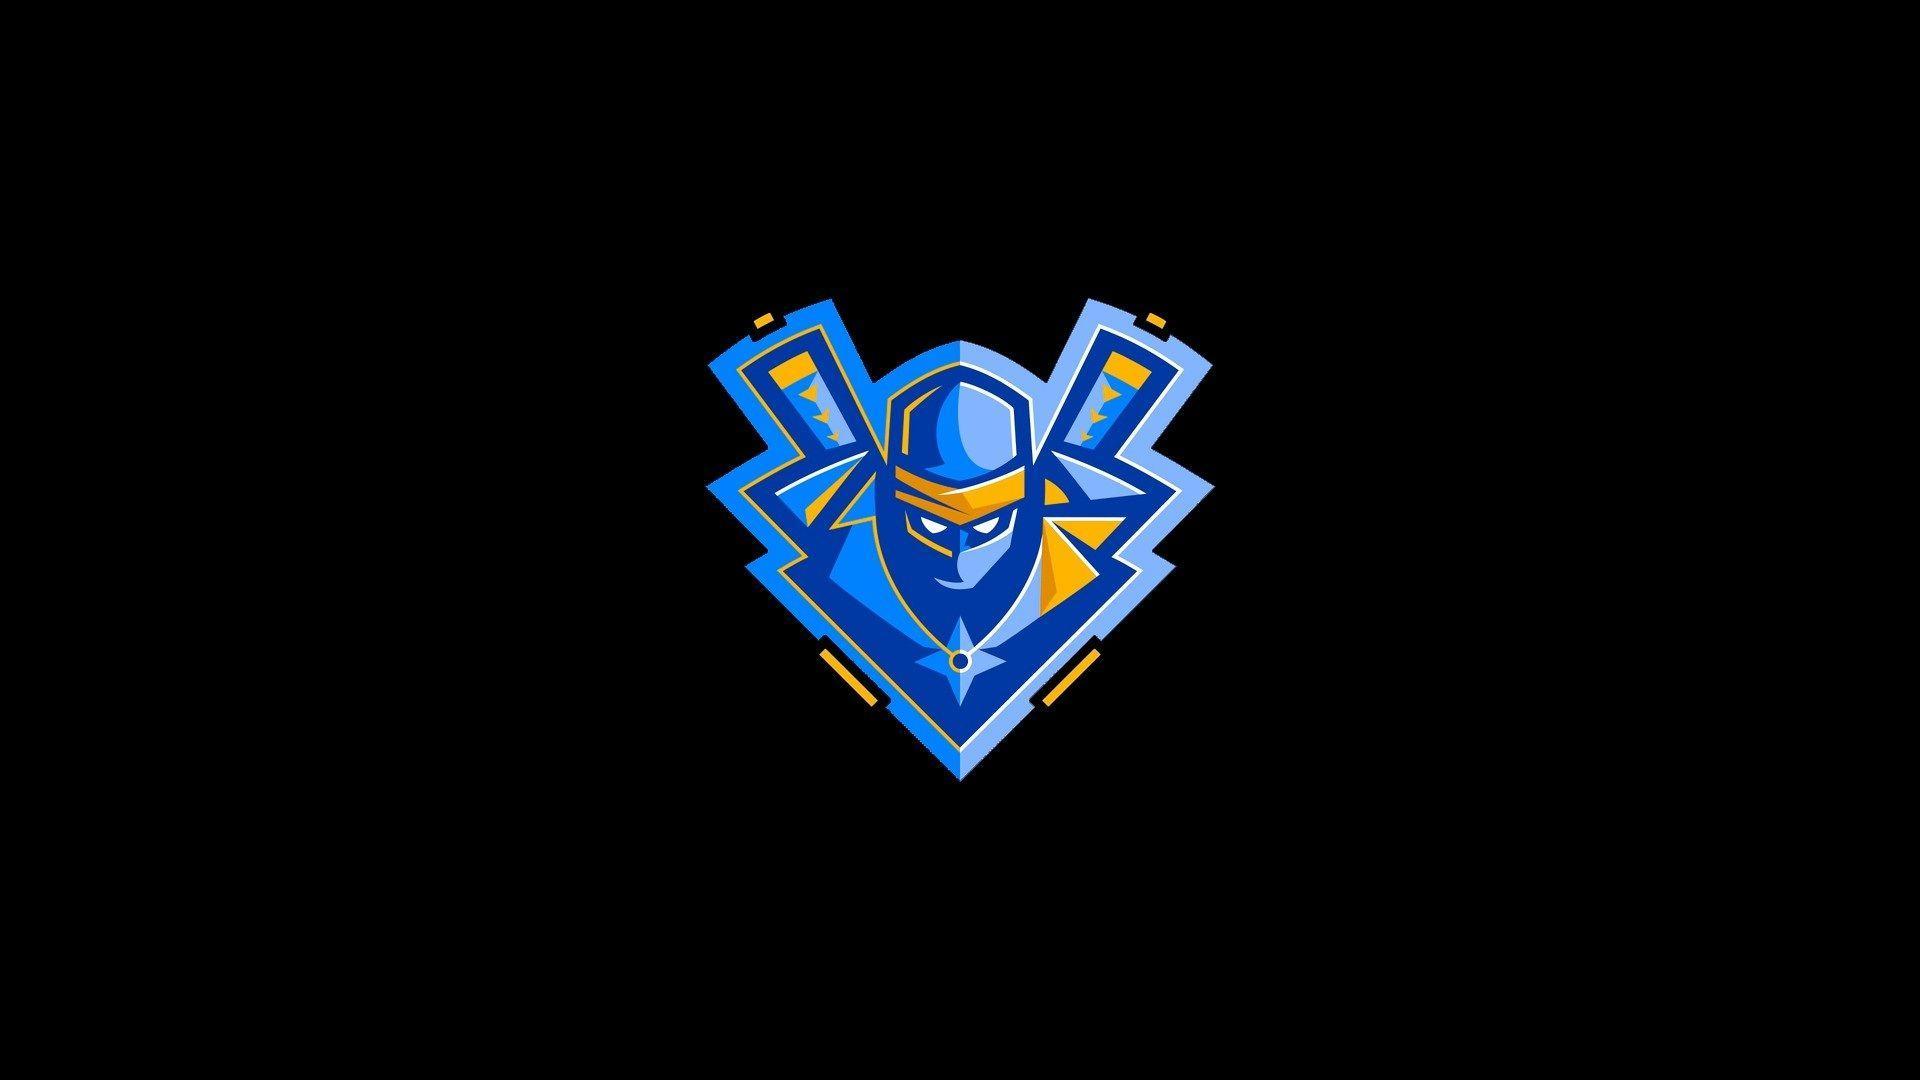 Fortnite Ninja Wallpapers: Ninja Logo Wallpapers